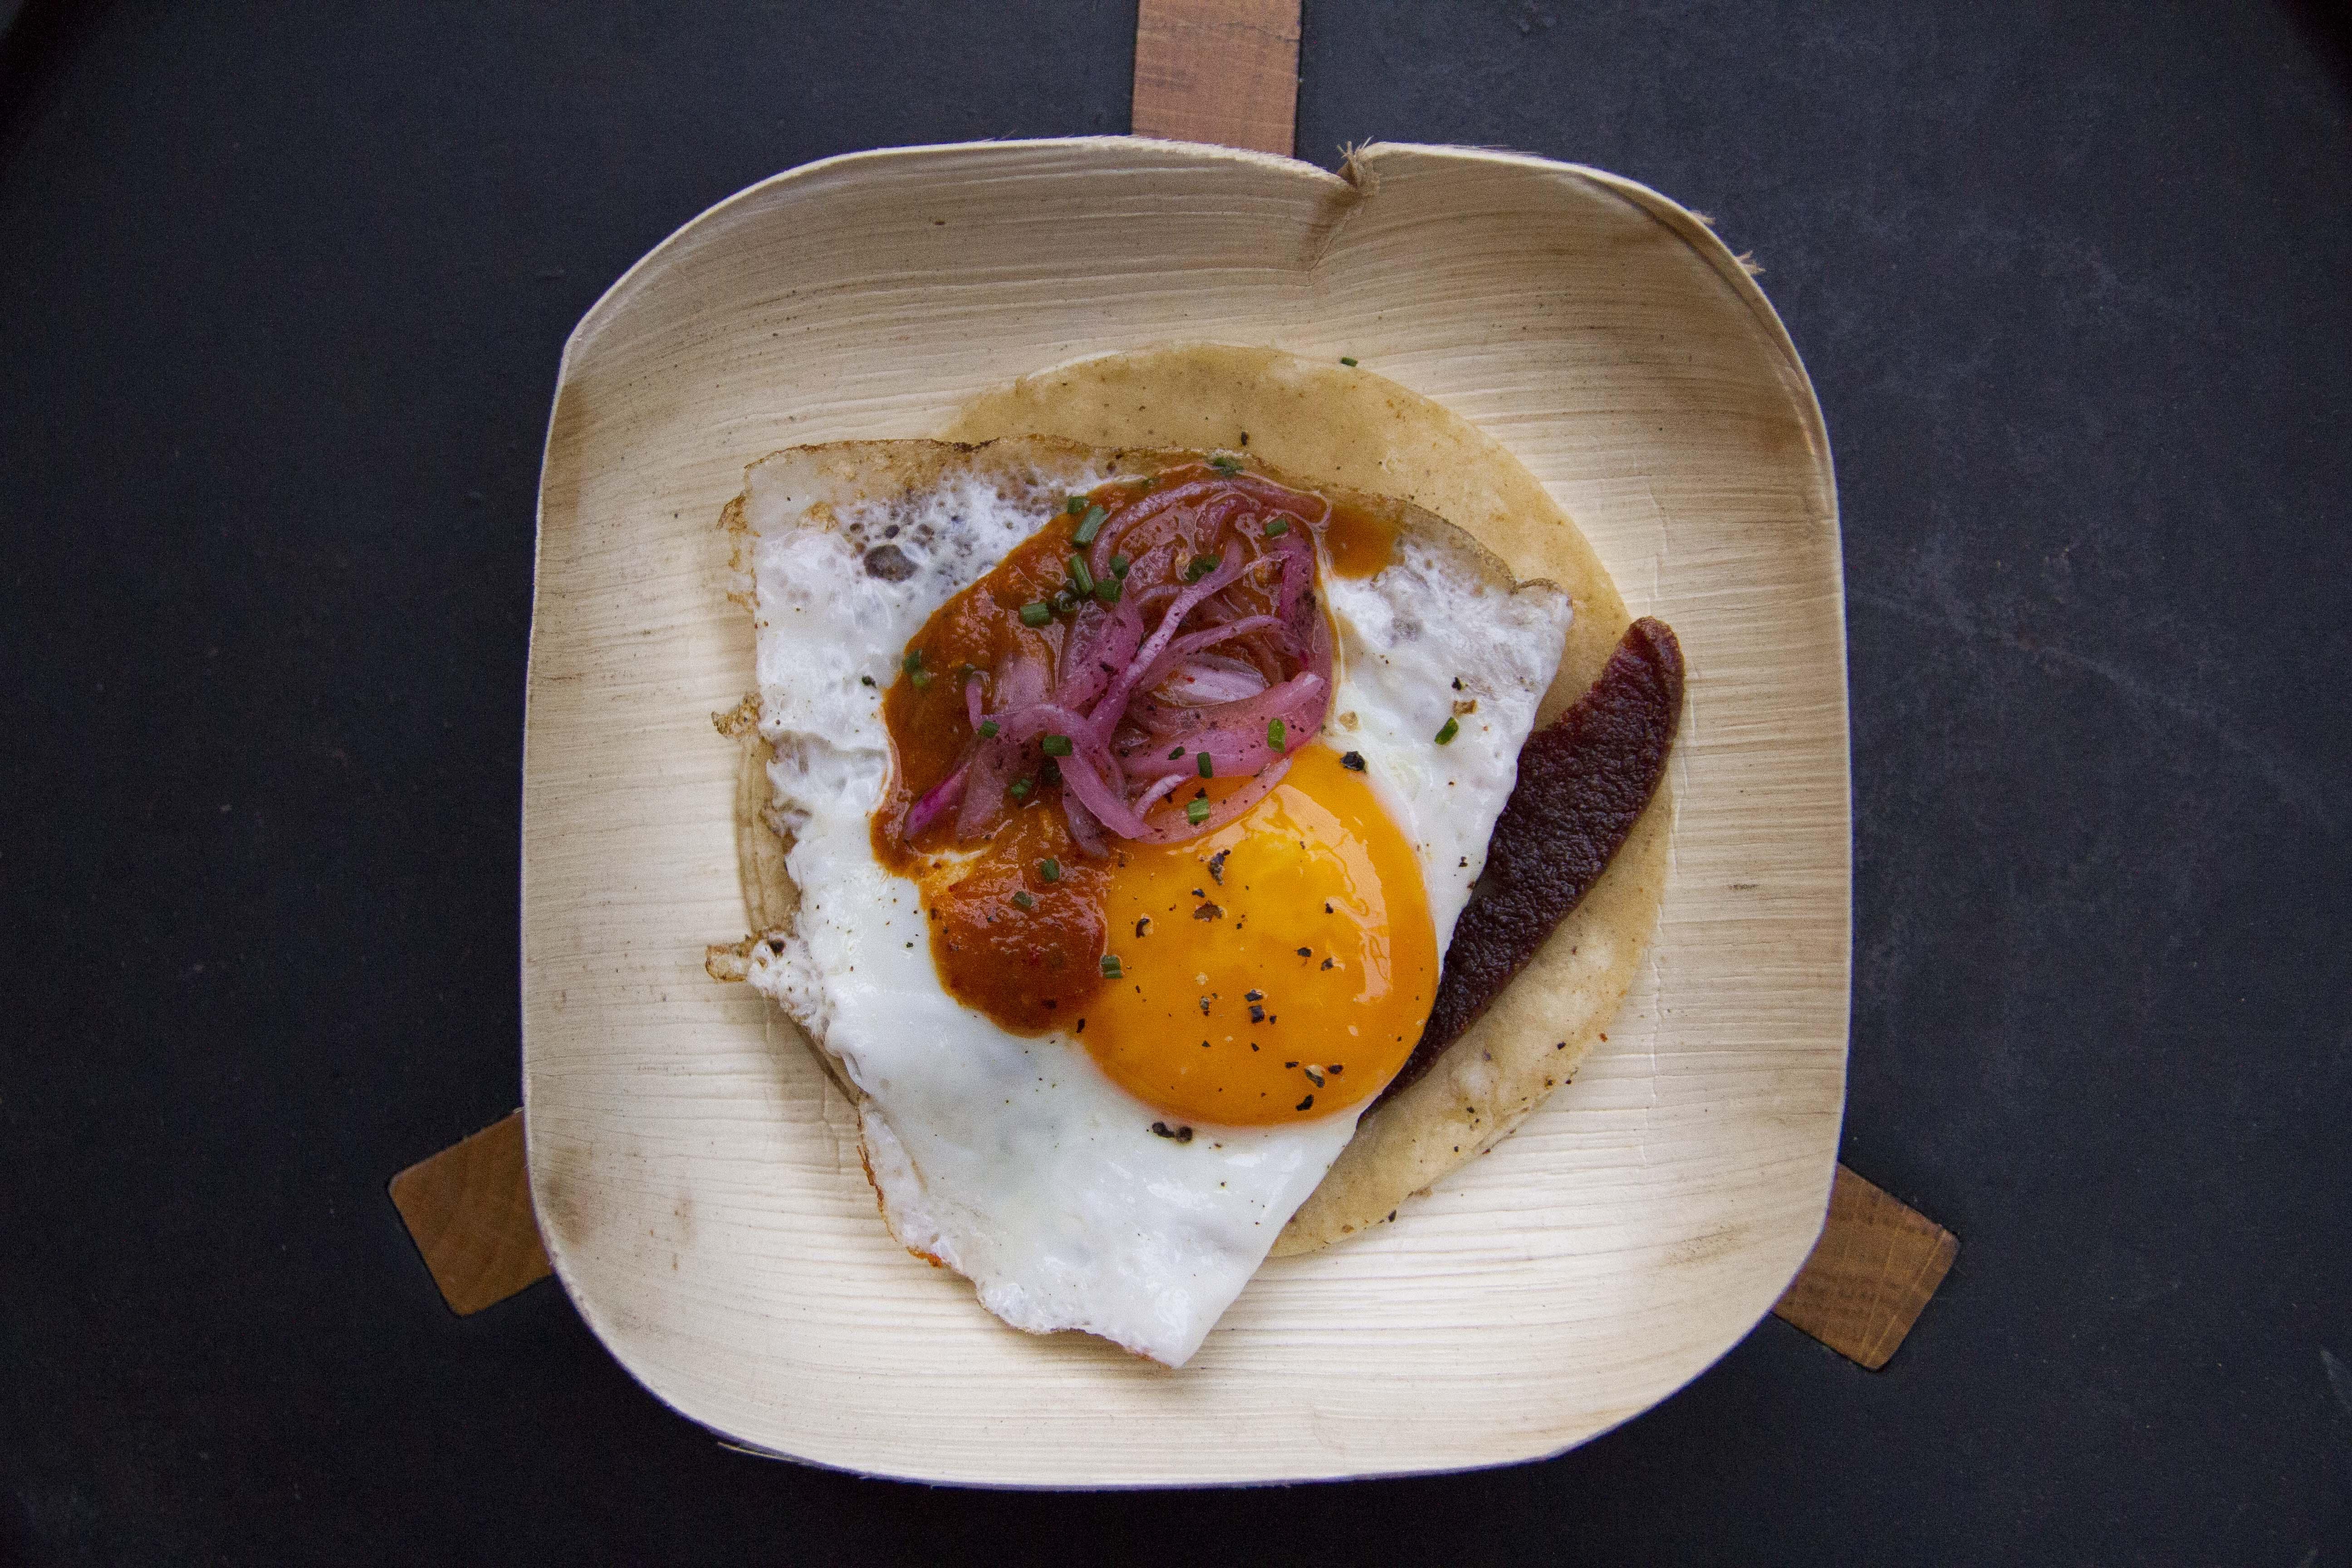 http://blog-assets.foodpairing.com/2015/10/Guerrilla-Fried-Egg-Pickled-Onions-Sujuc.jpg